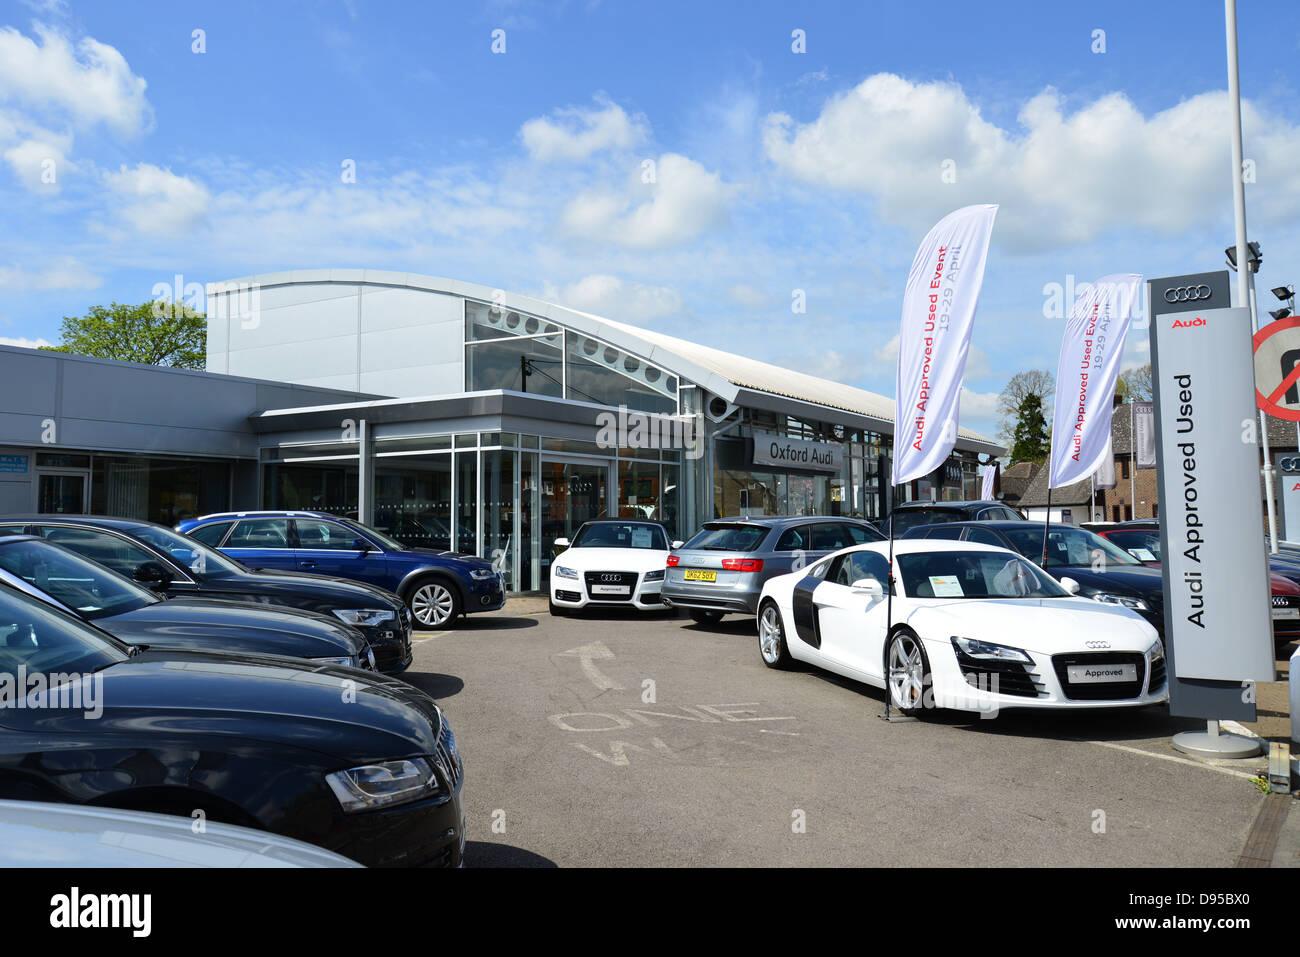 Oxford Audi Car Dealer Oxford Road Kidlington Oxfordshire Stock - Audi car showroom